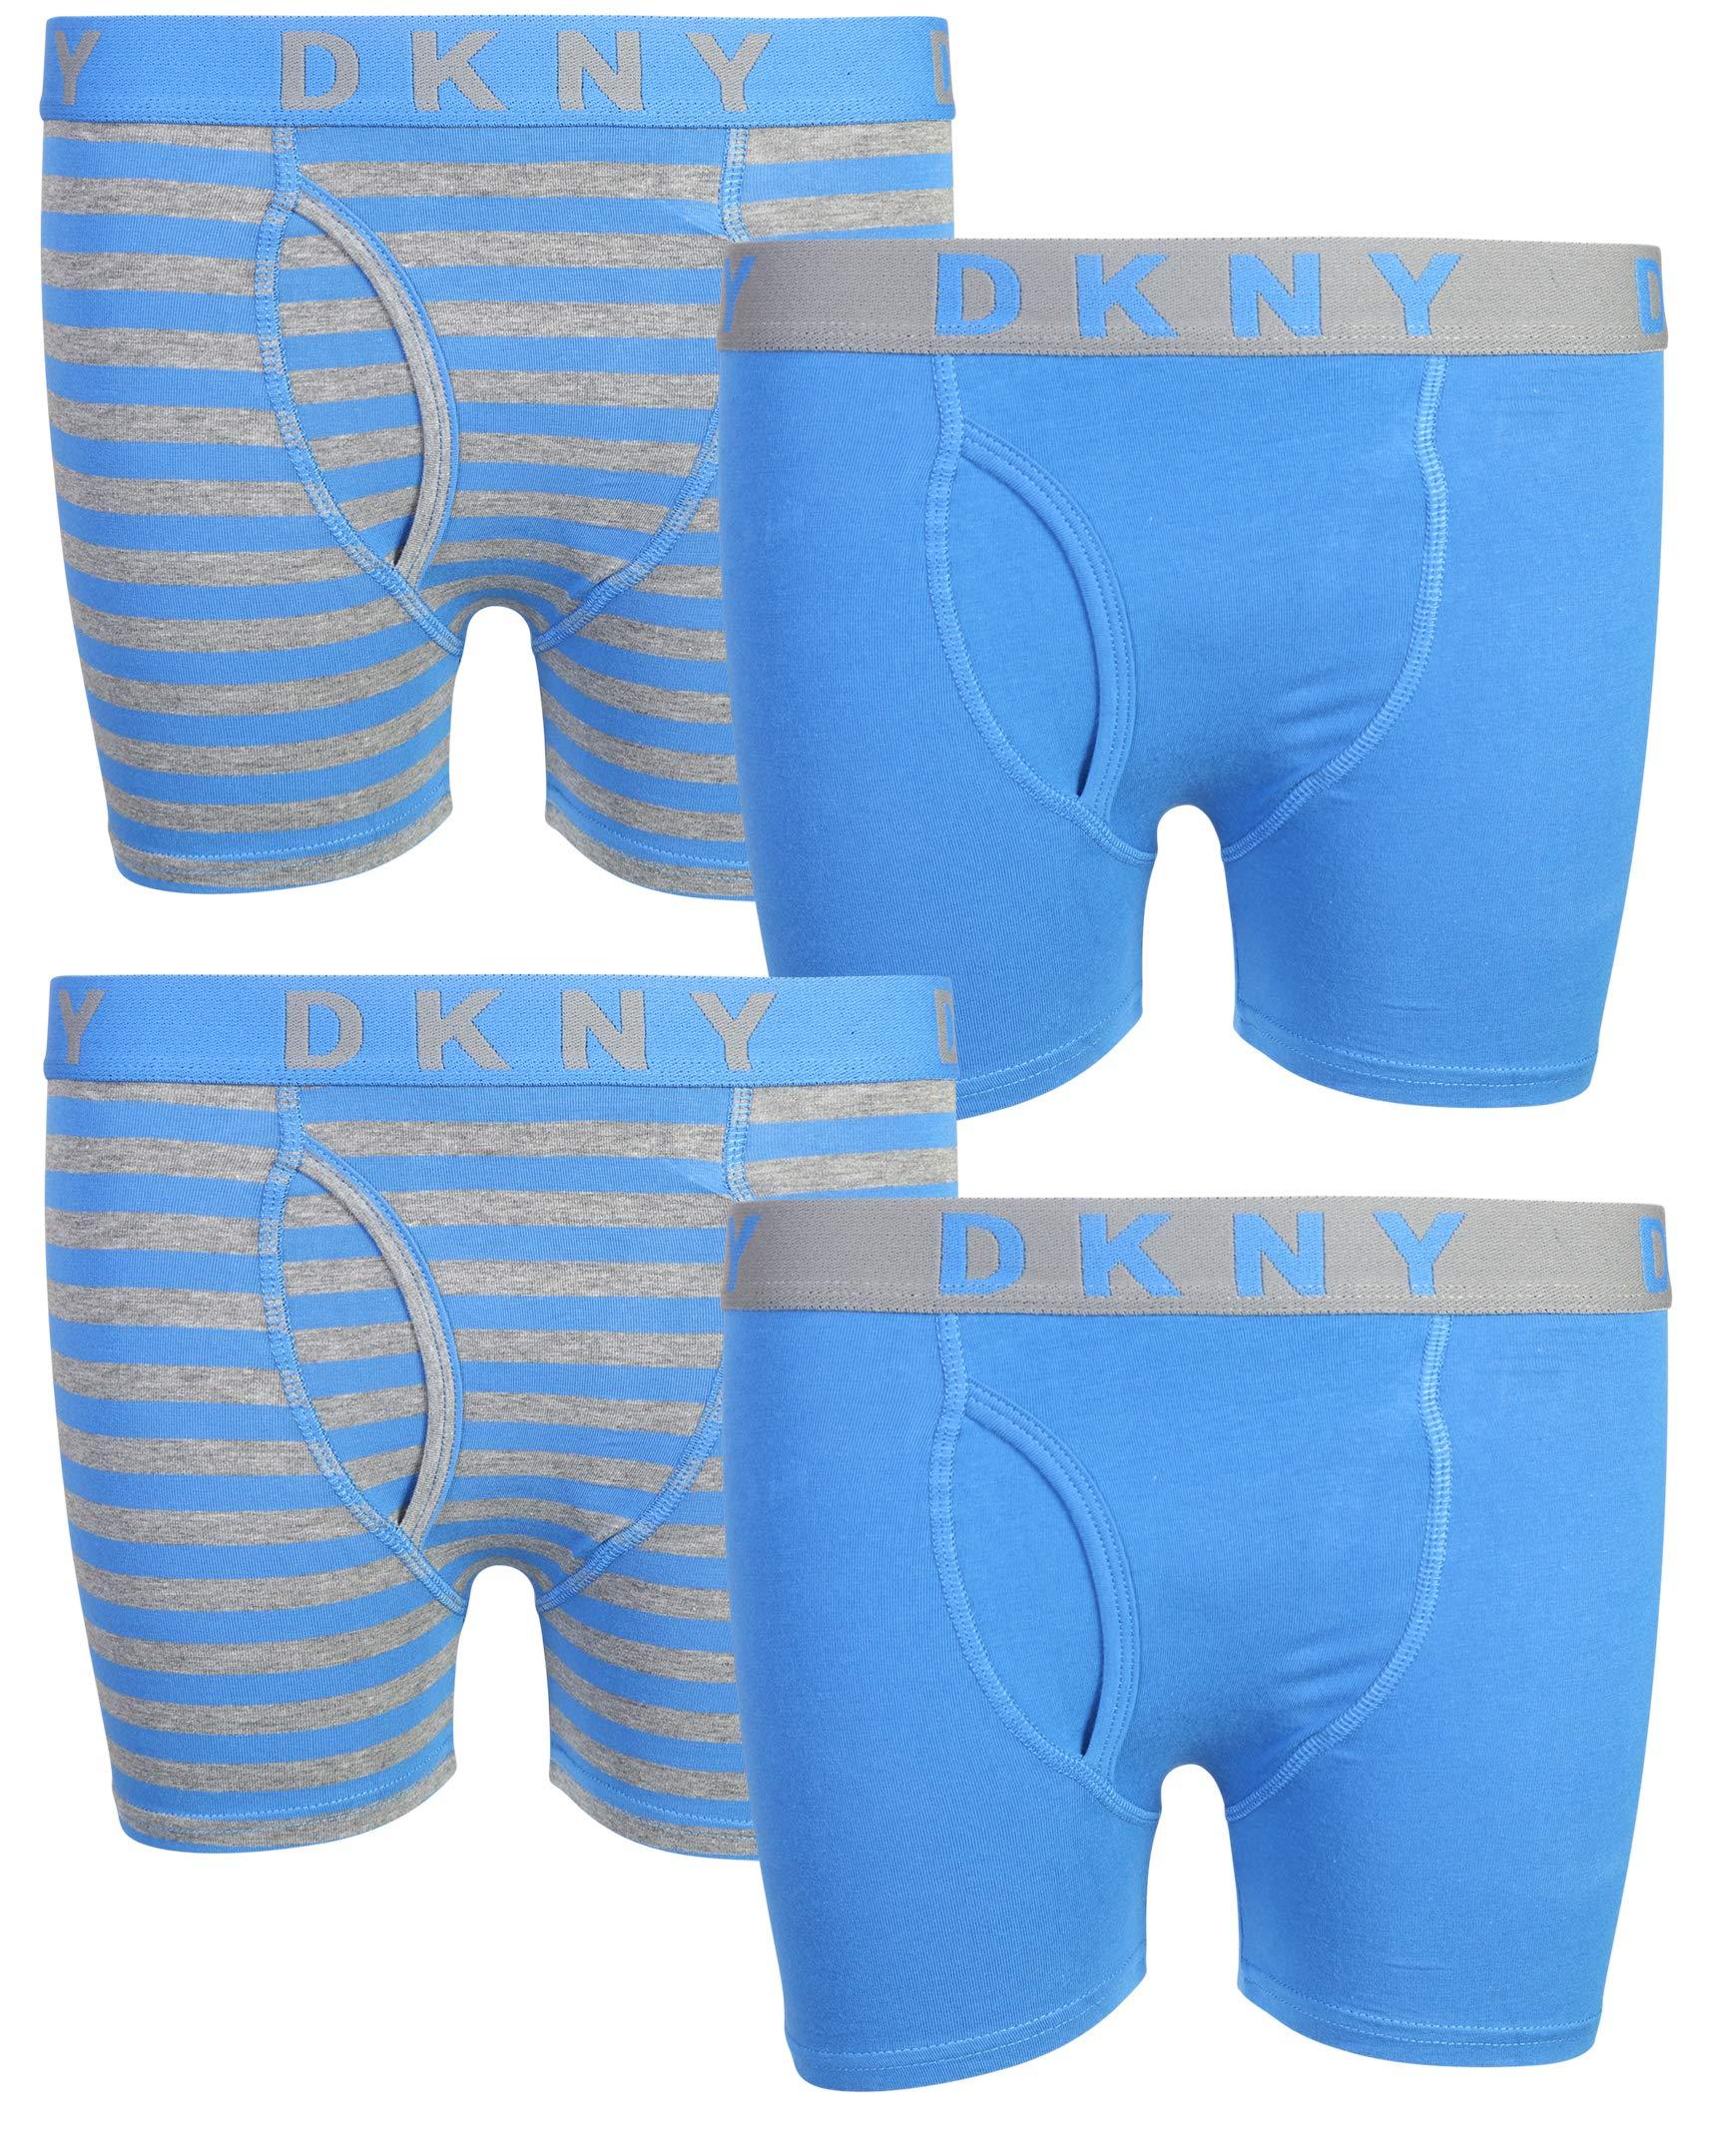 DKNY Boy's (4 Pack) Boxer Brief Underwear, (Medium/10-12, Blue/Stripes)'